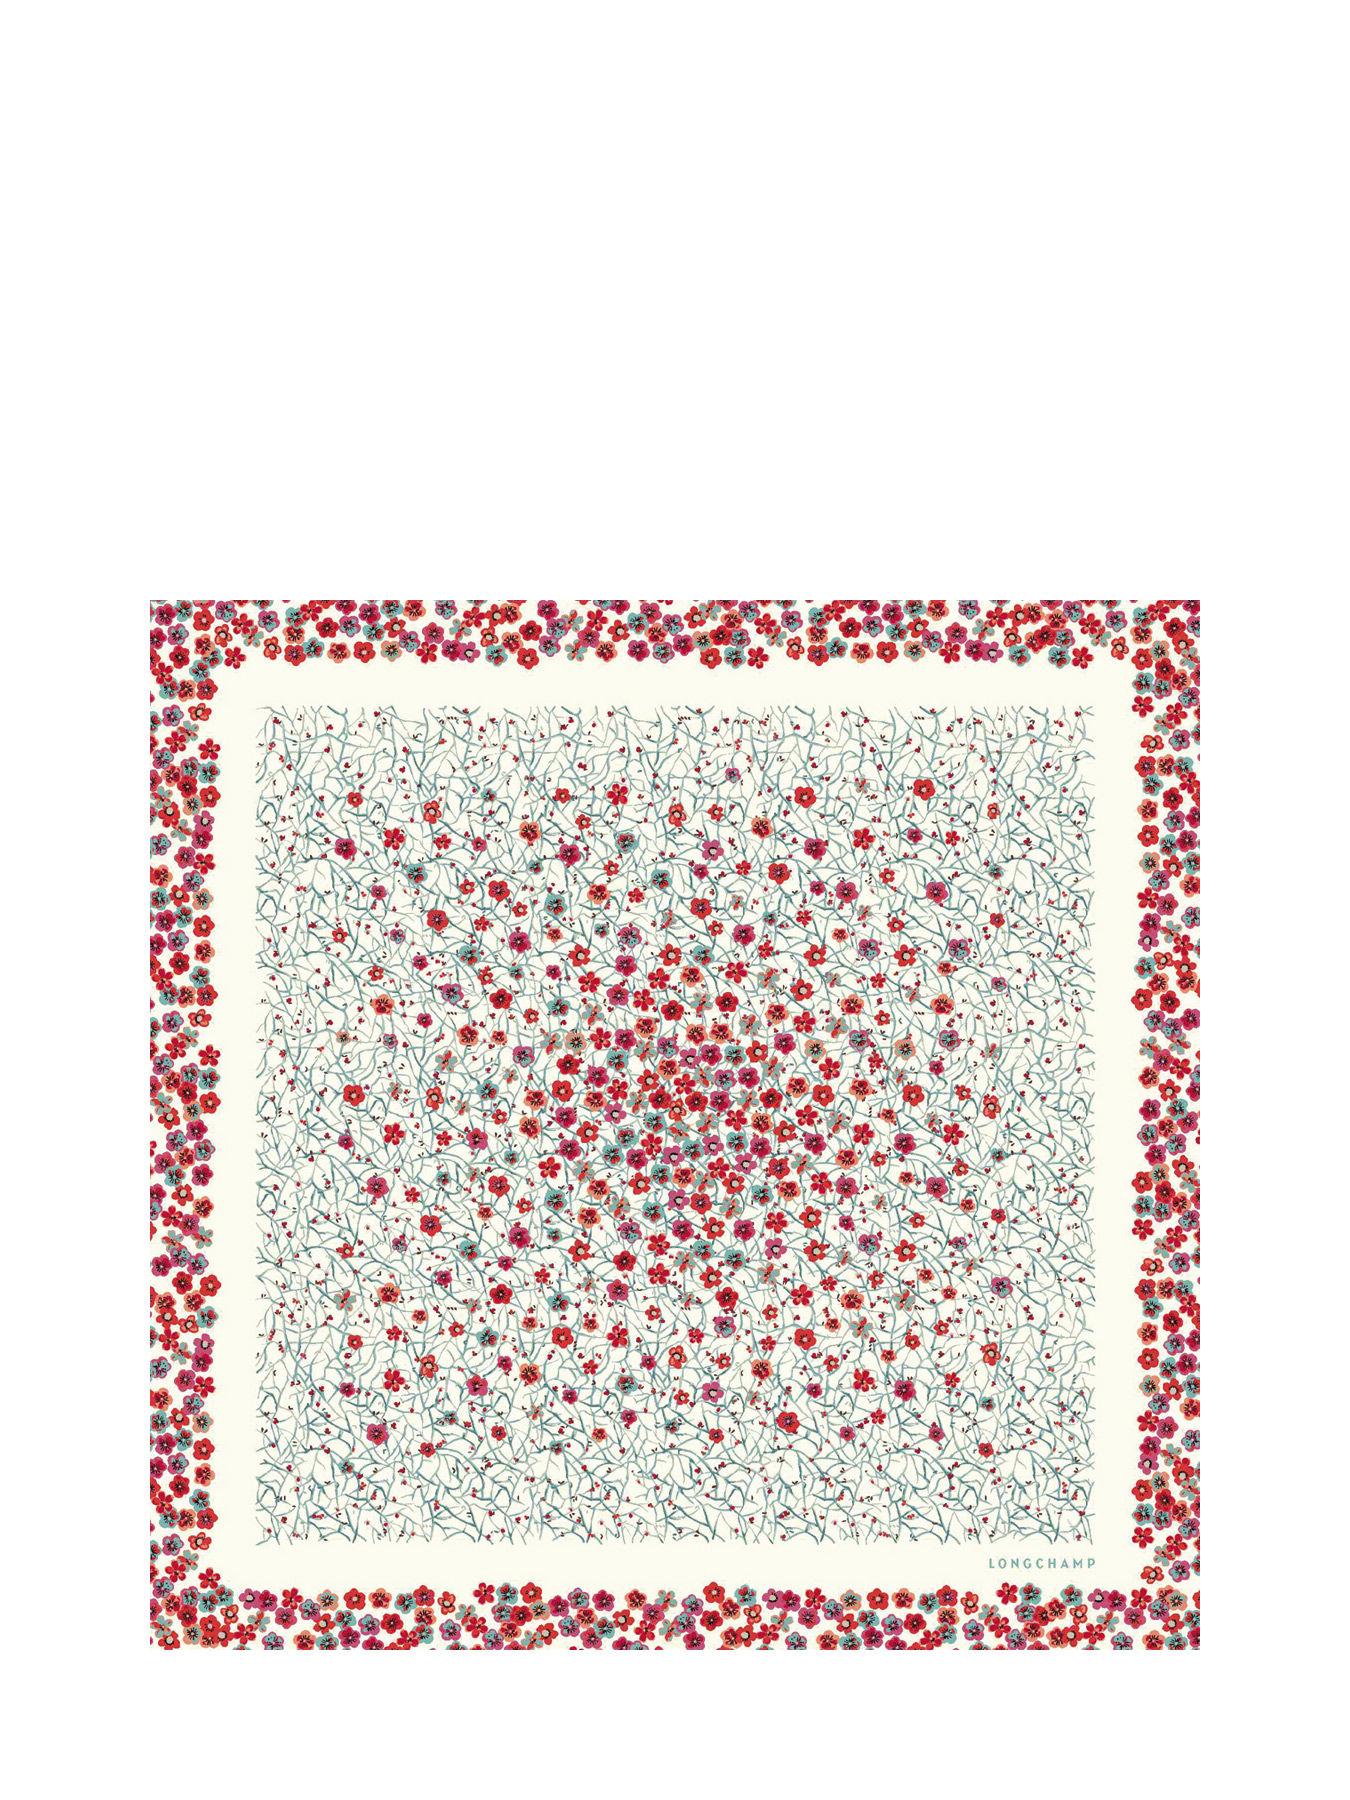 Longchamp Scarves Red